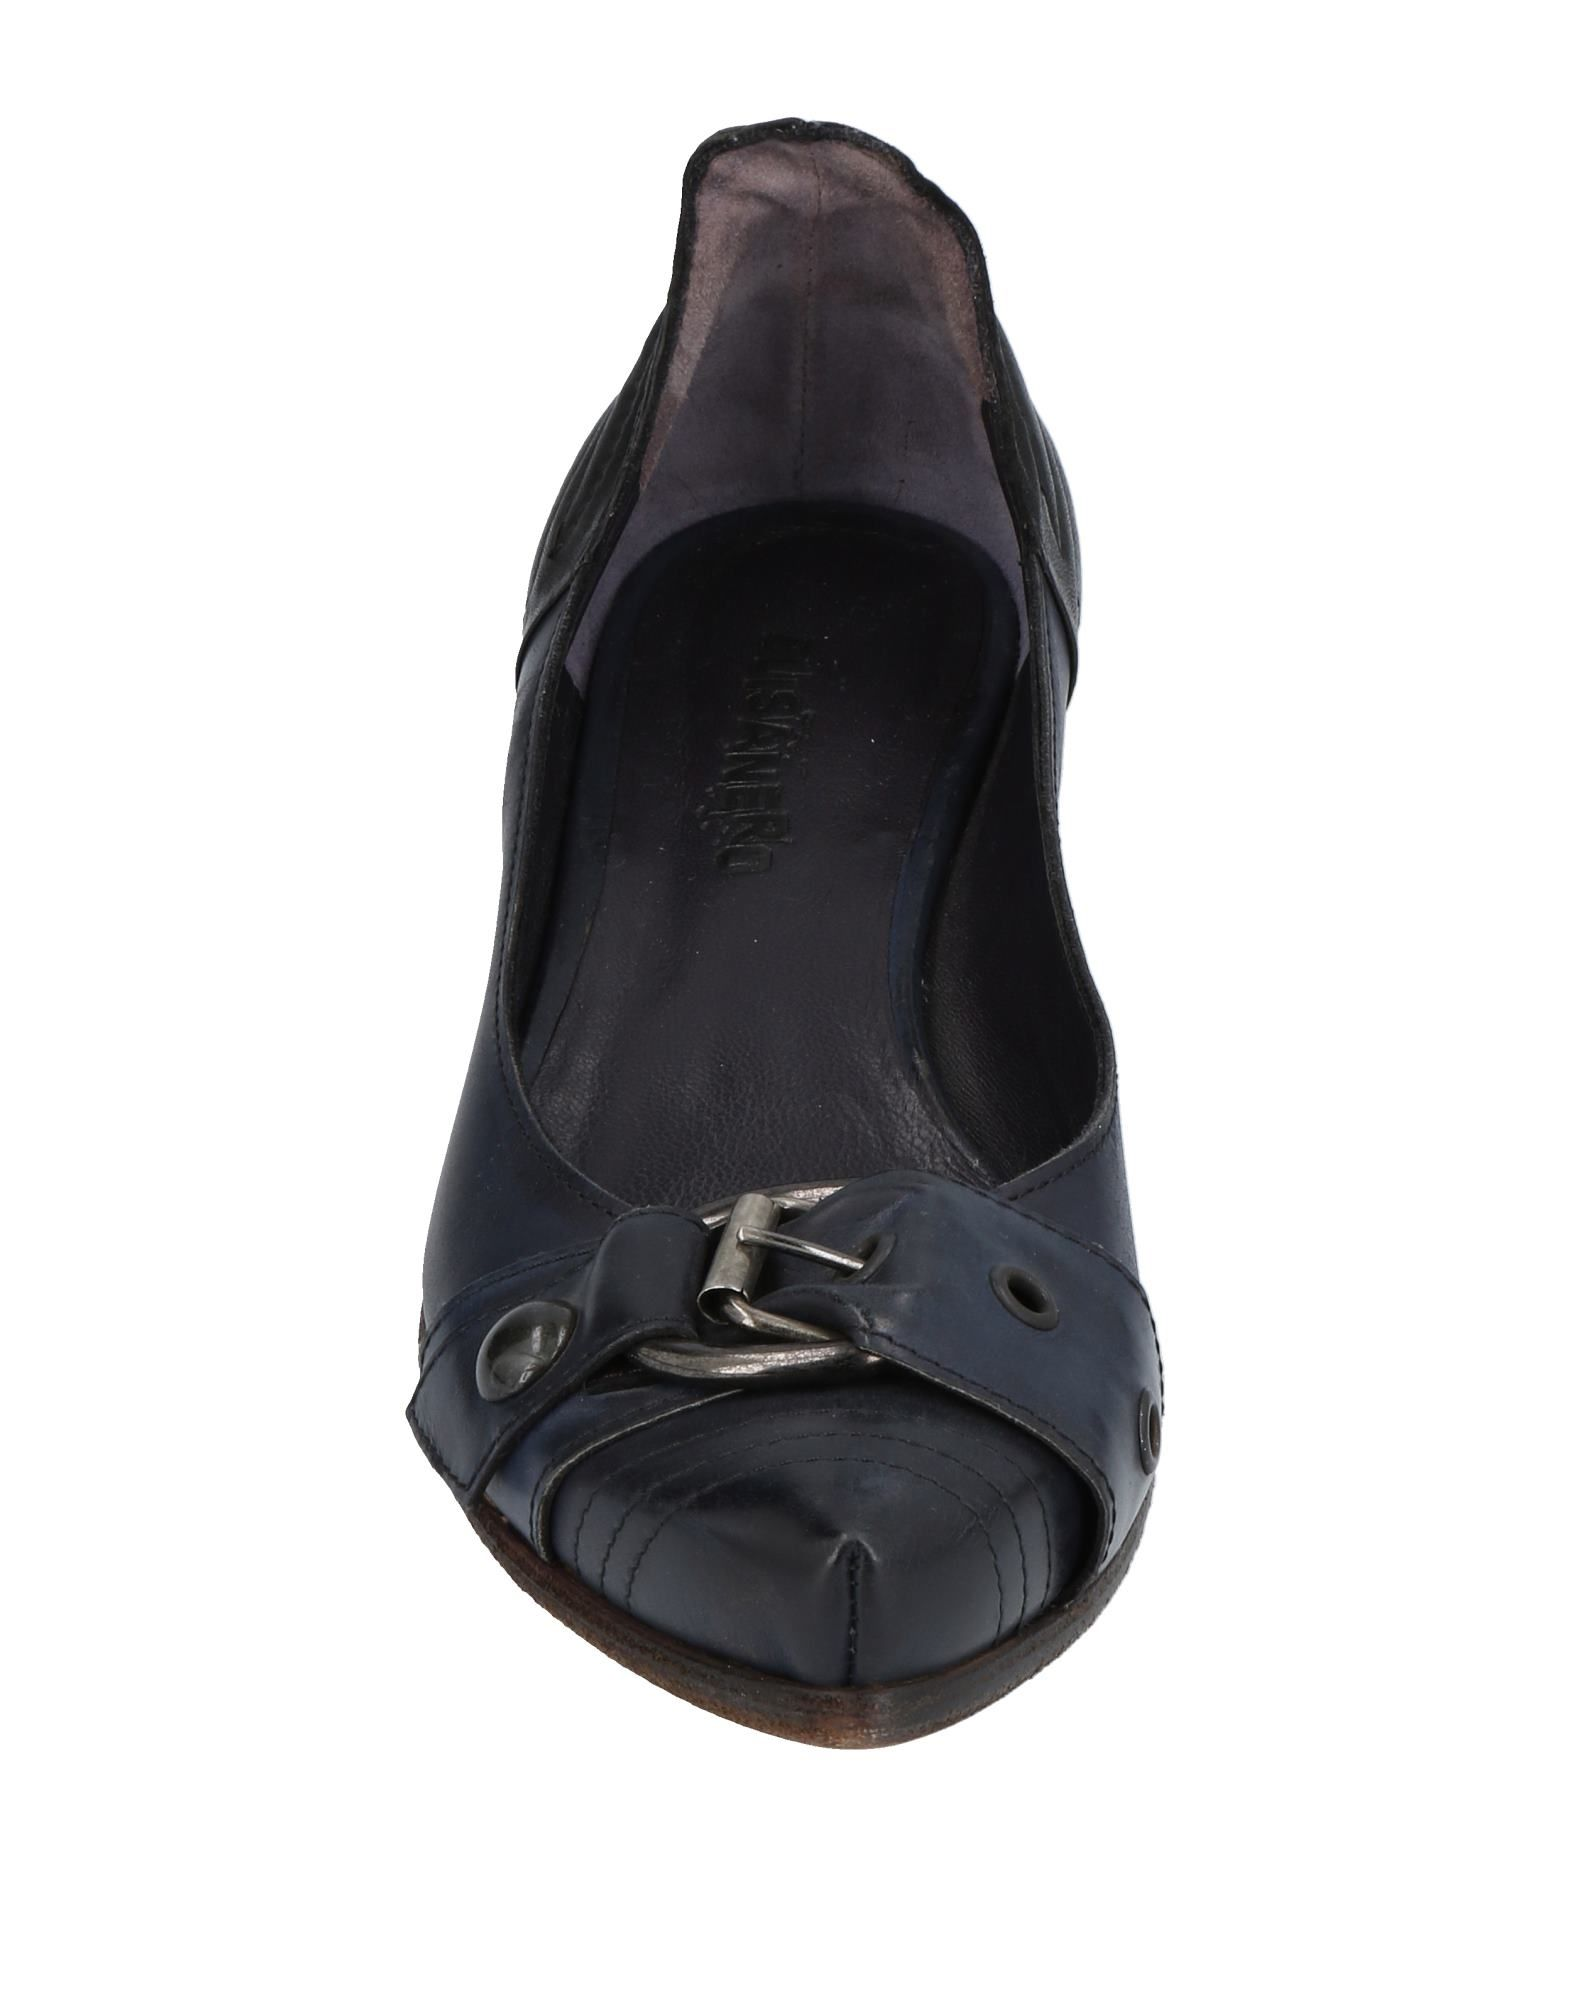 Elisanero Ballet Flats Flats Flats - Women Elisanero Ballet Flats online on  United Kingdom - 11454200DA b65aeb